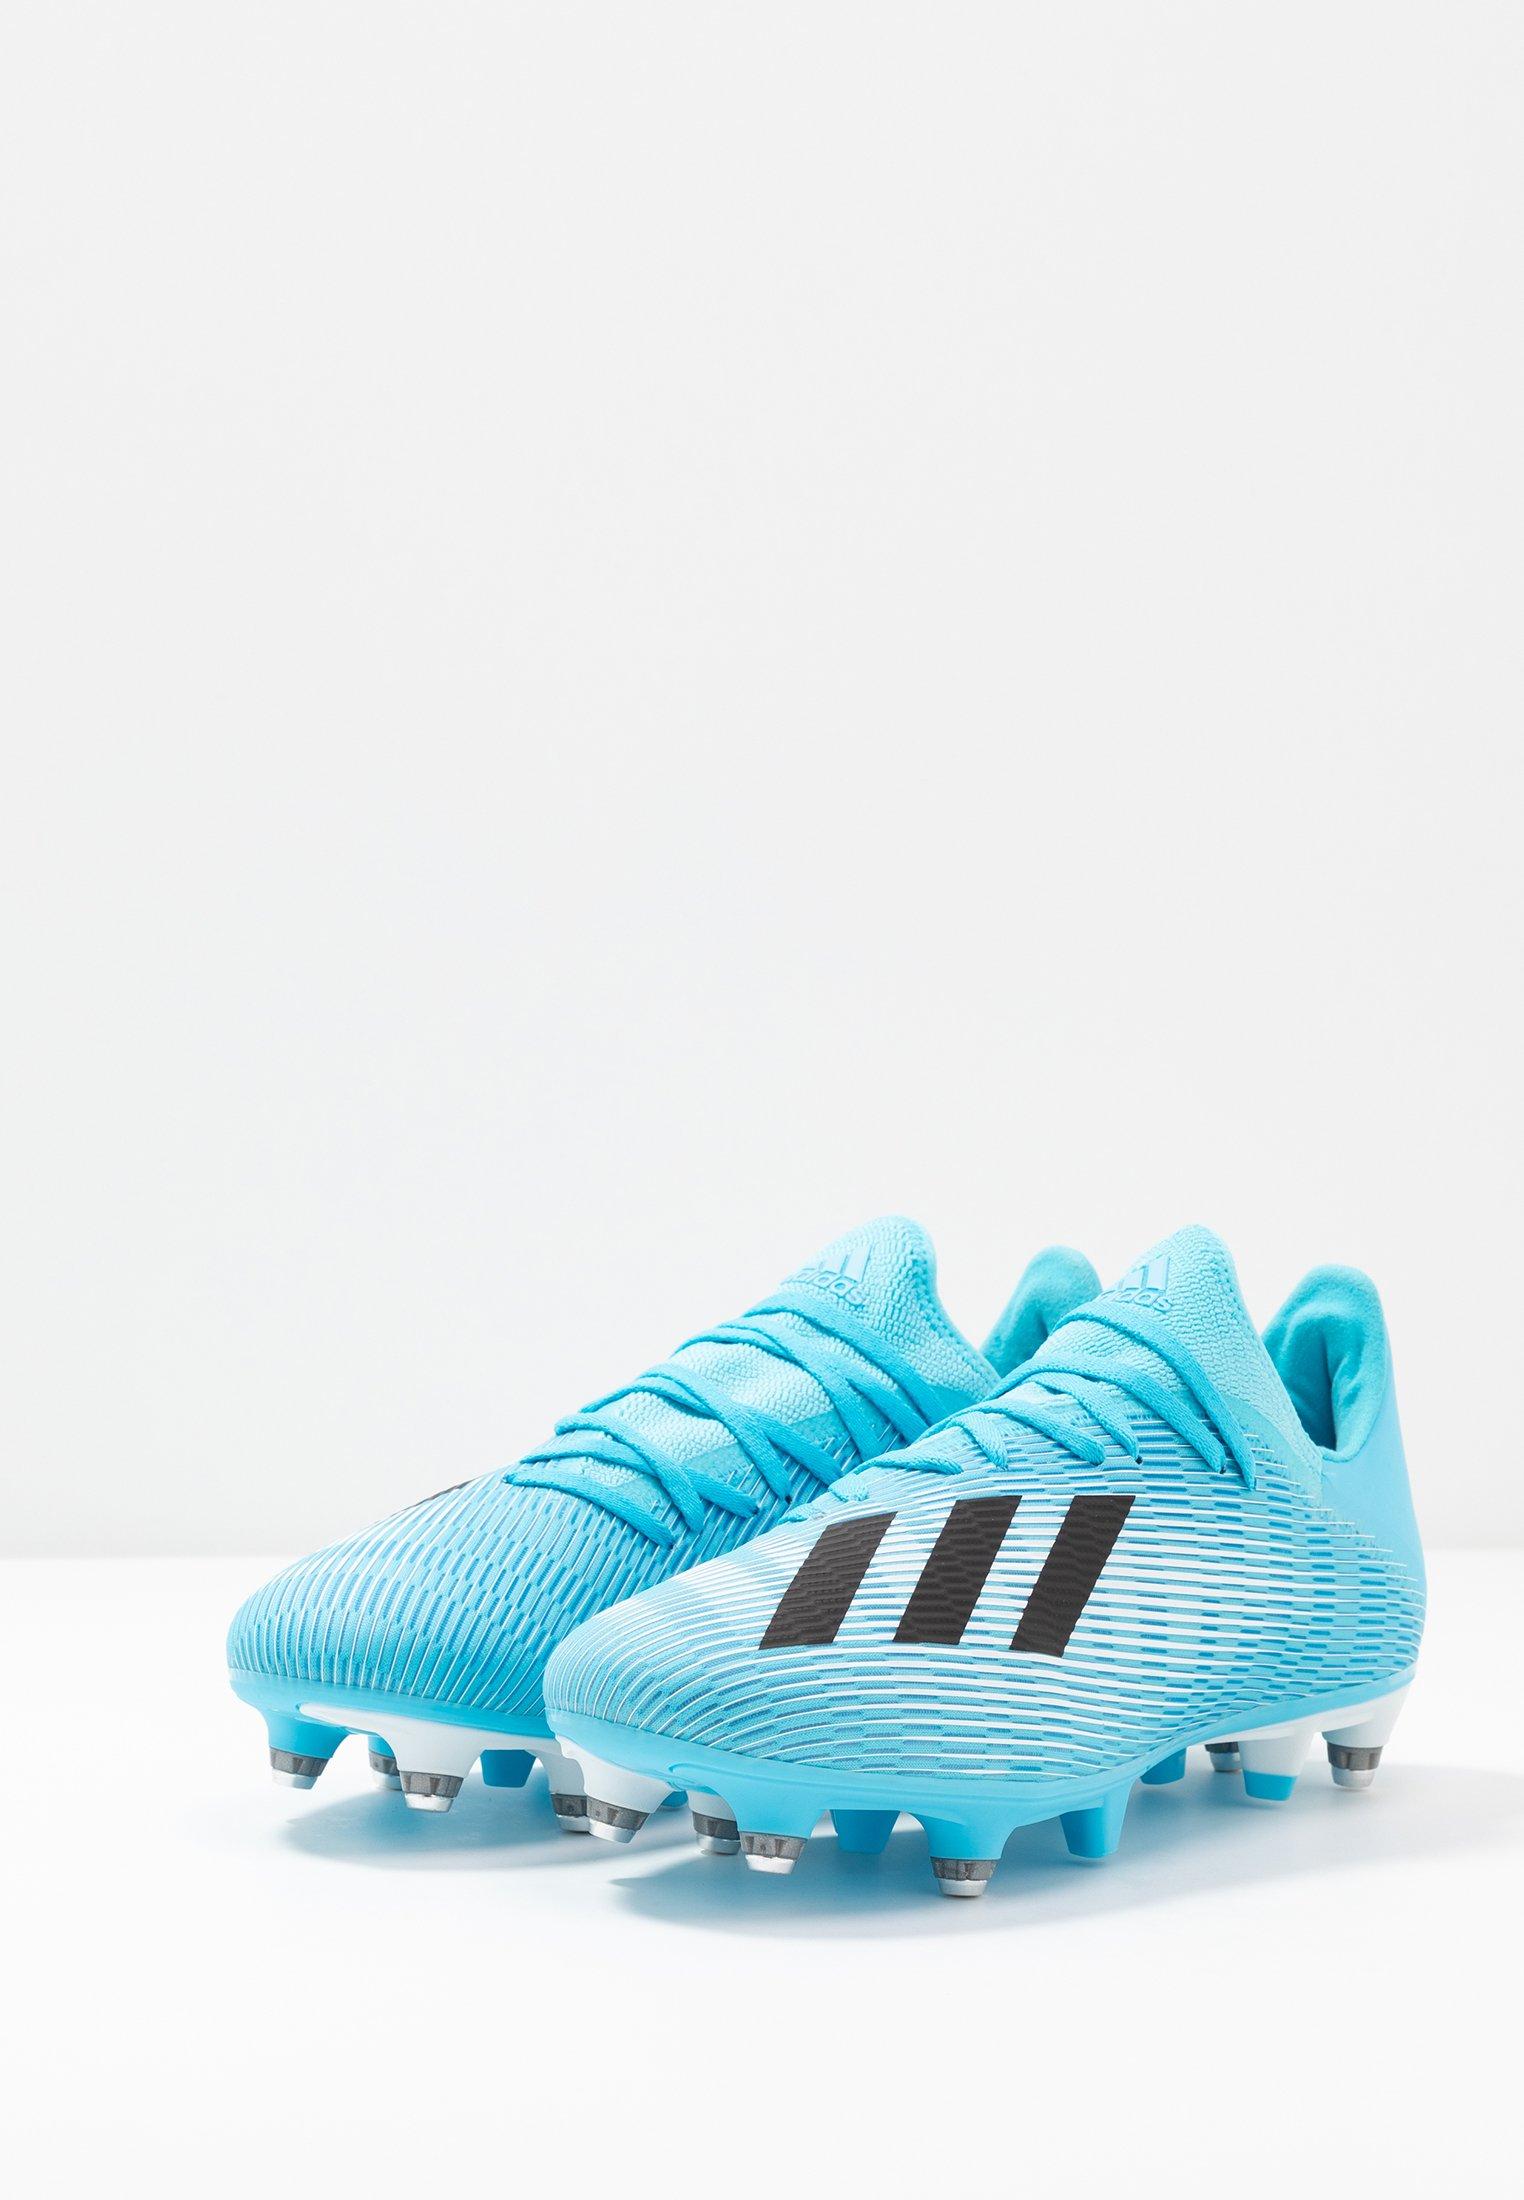 Adidas X 19.3 SG Fußballschuh Bright Cyan Core Black